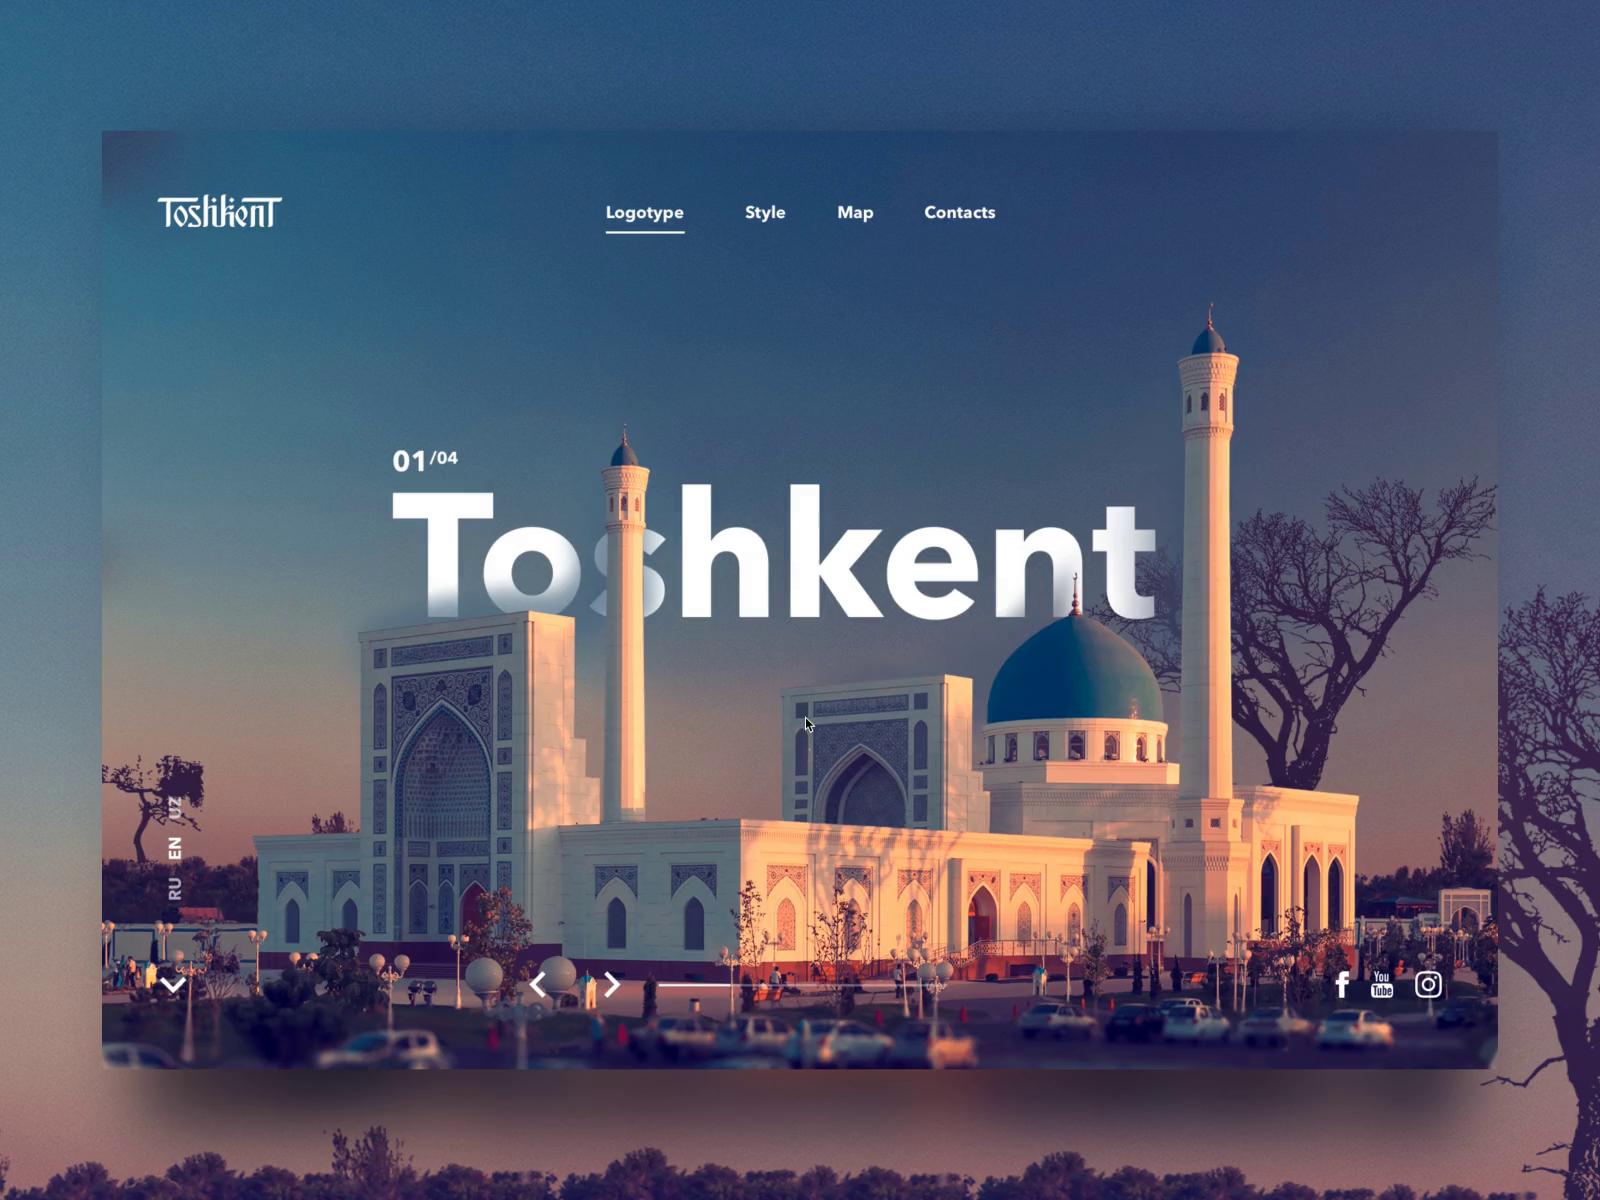 Toshkent tashkent 1600x1200